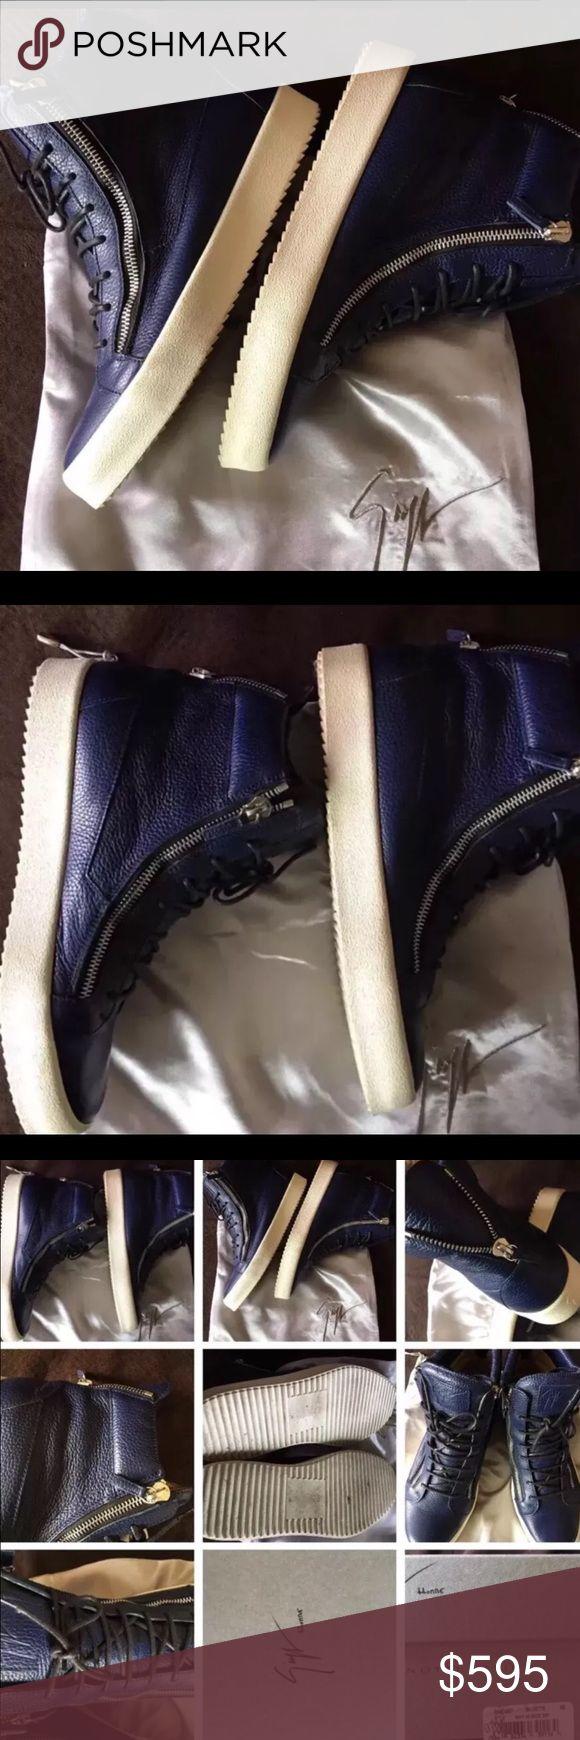 Giuseppe Zanotti Size 48 Men's Worn one time Giuseppe Zanotti Shoes Sneakers